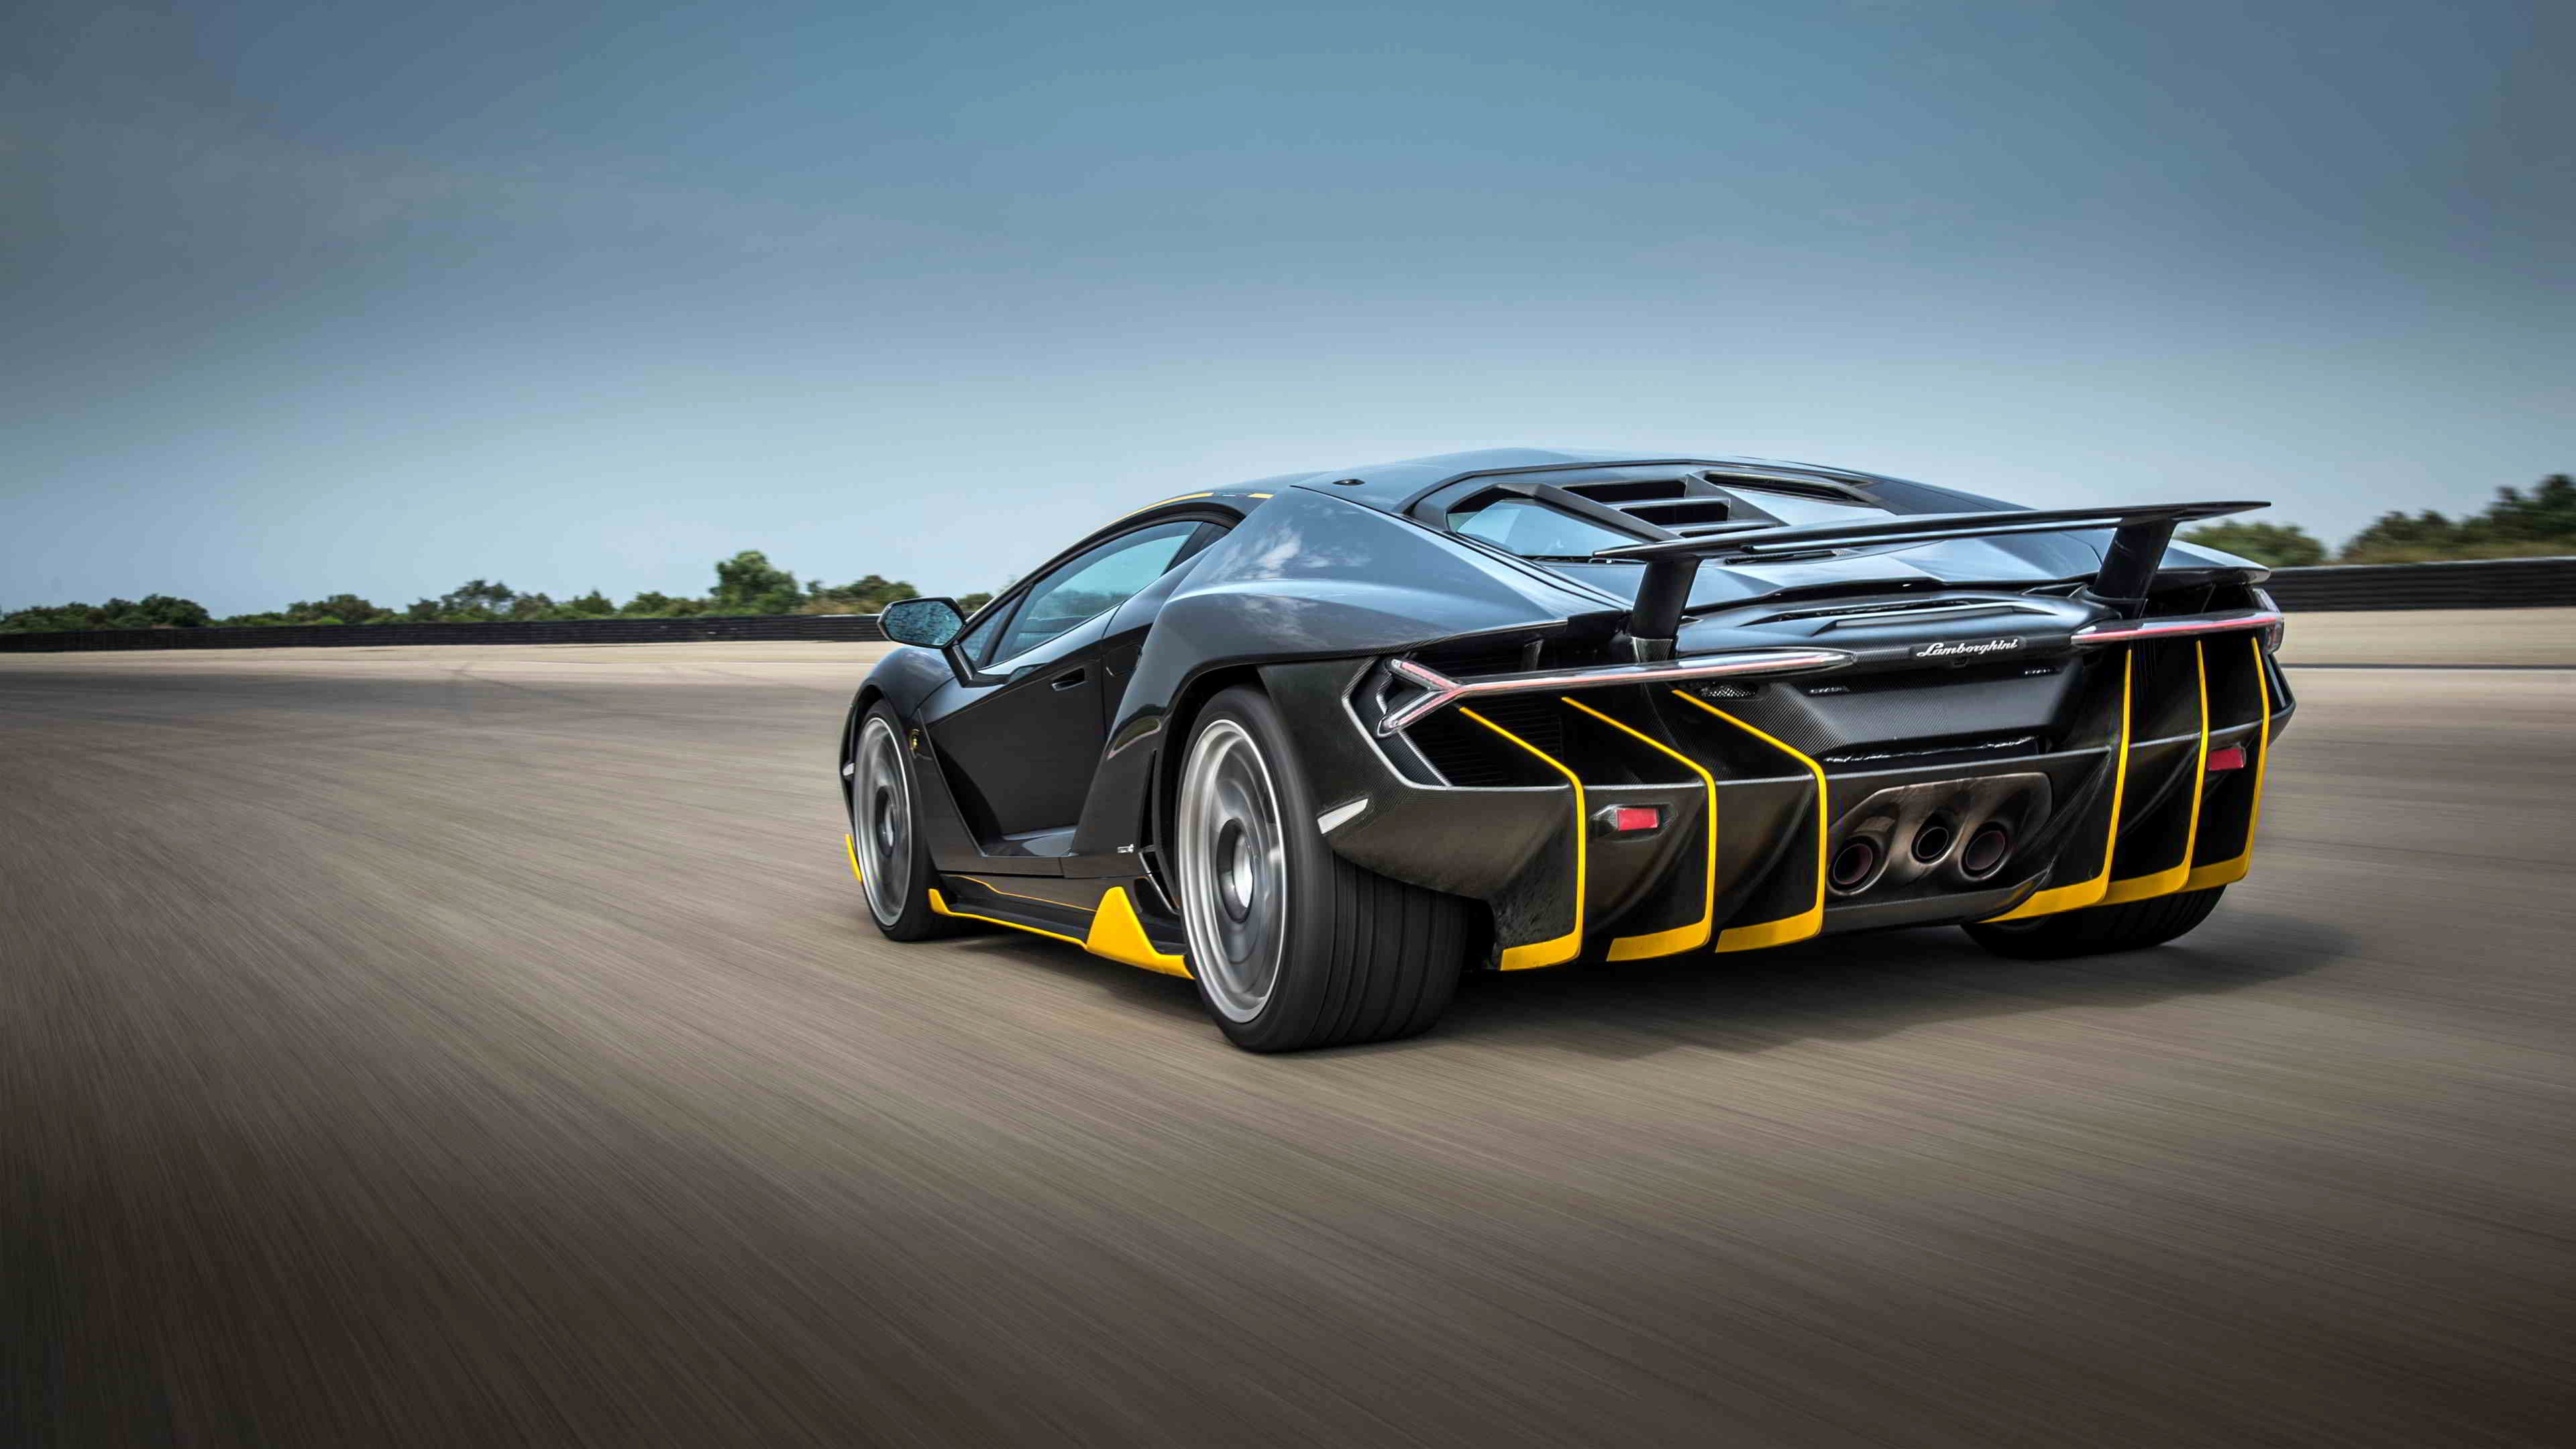 79 Hd Laptop Wallpapers On Wallpaperplay In 2020 Lamborghini Centenario Cool Wallpapers Cars Sports Car Wallpaper